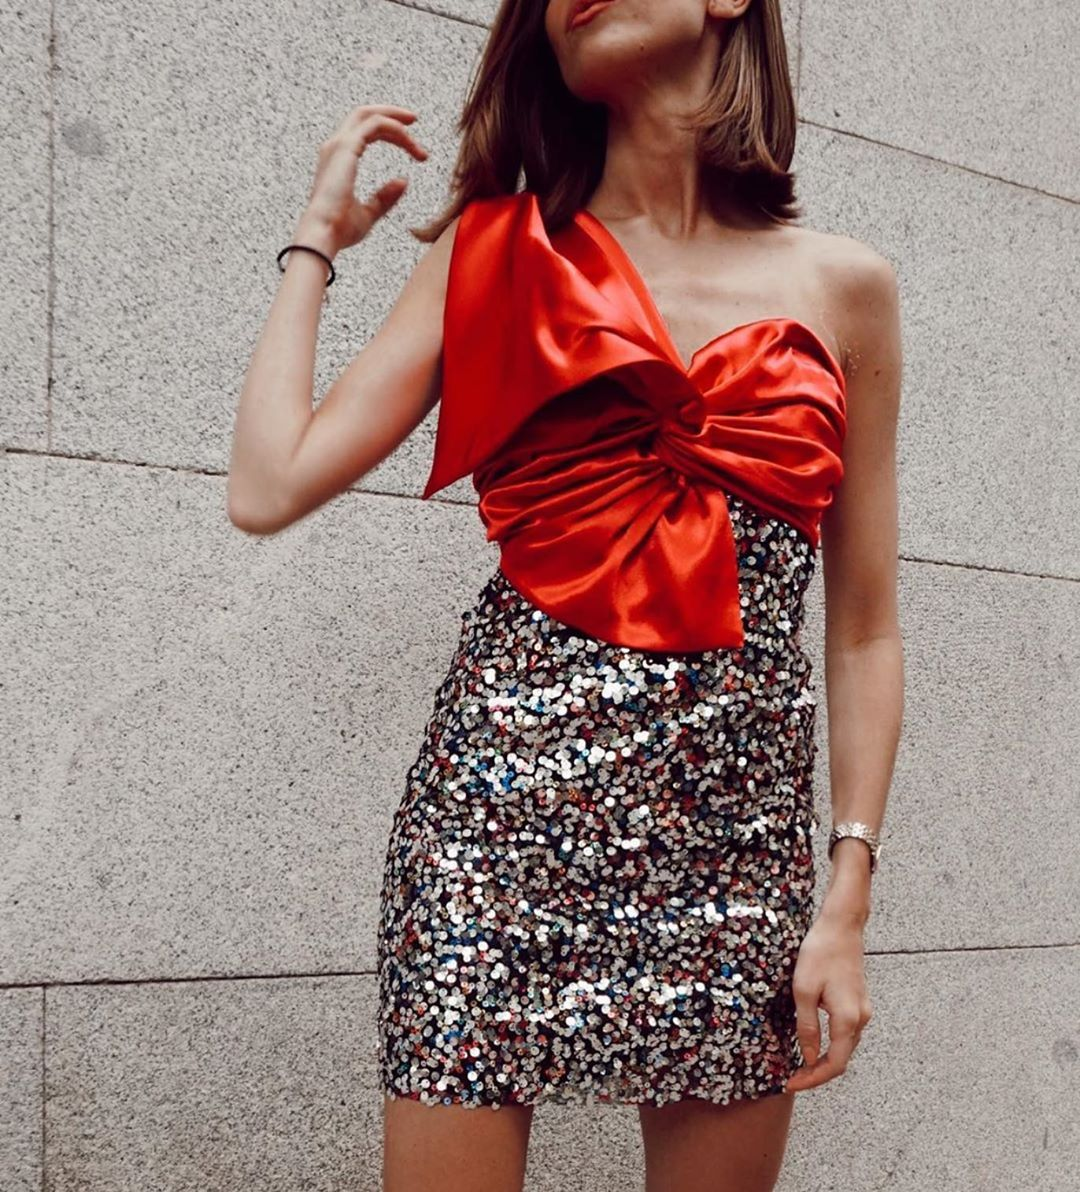 short dress with sequins and bow de Zara sur zaraaddiction